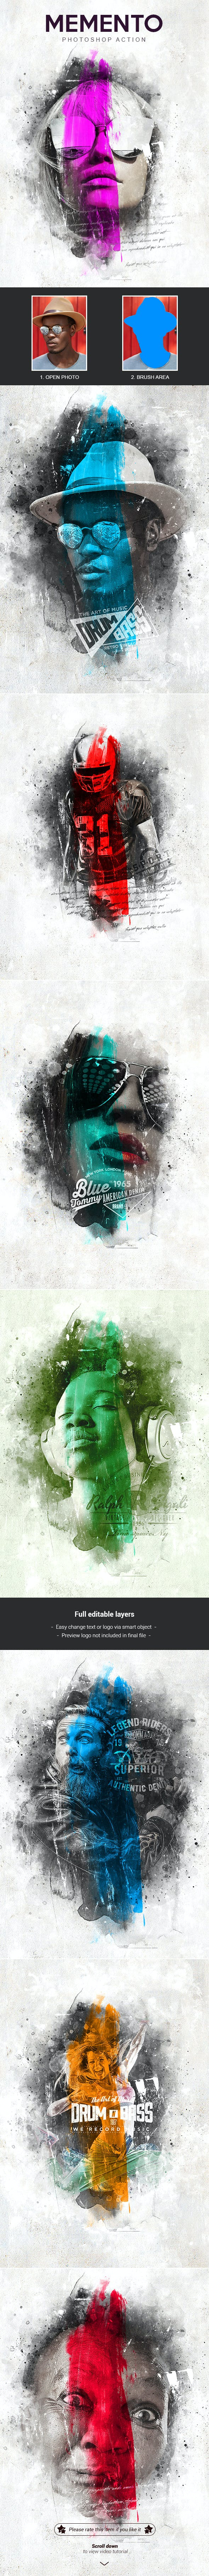 Memento - Photoshop Action